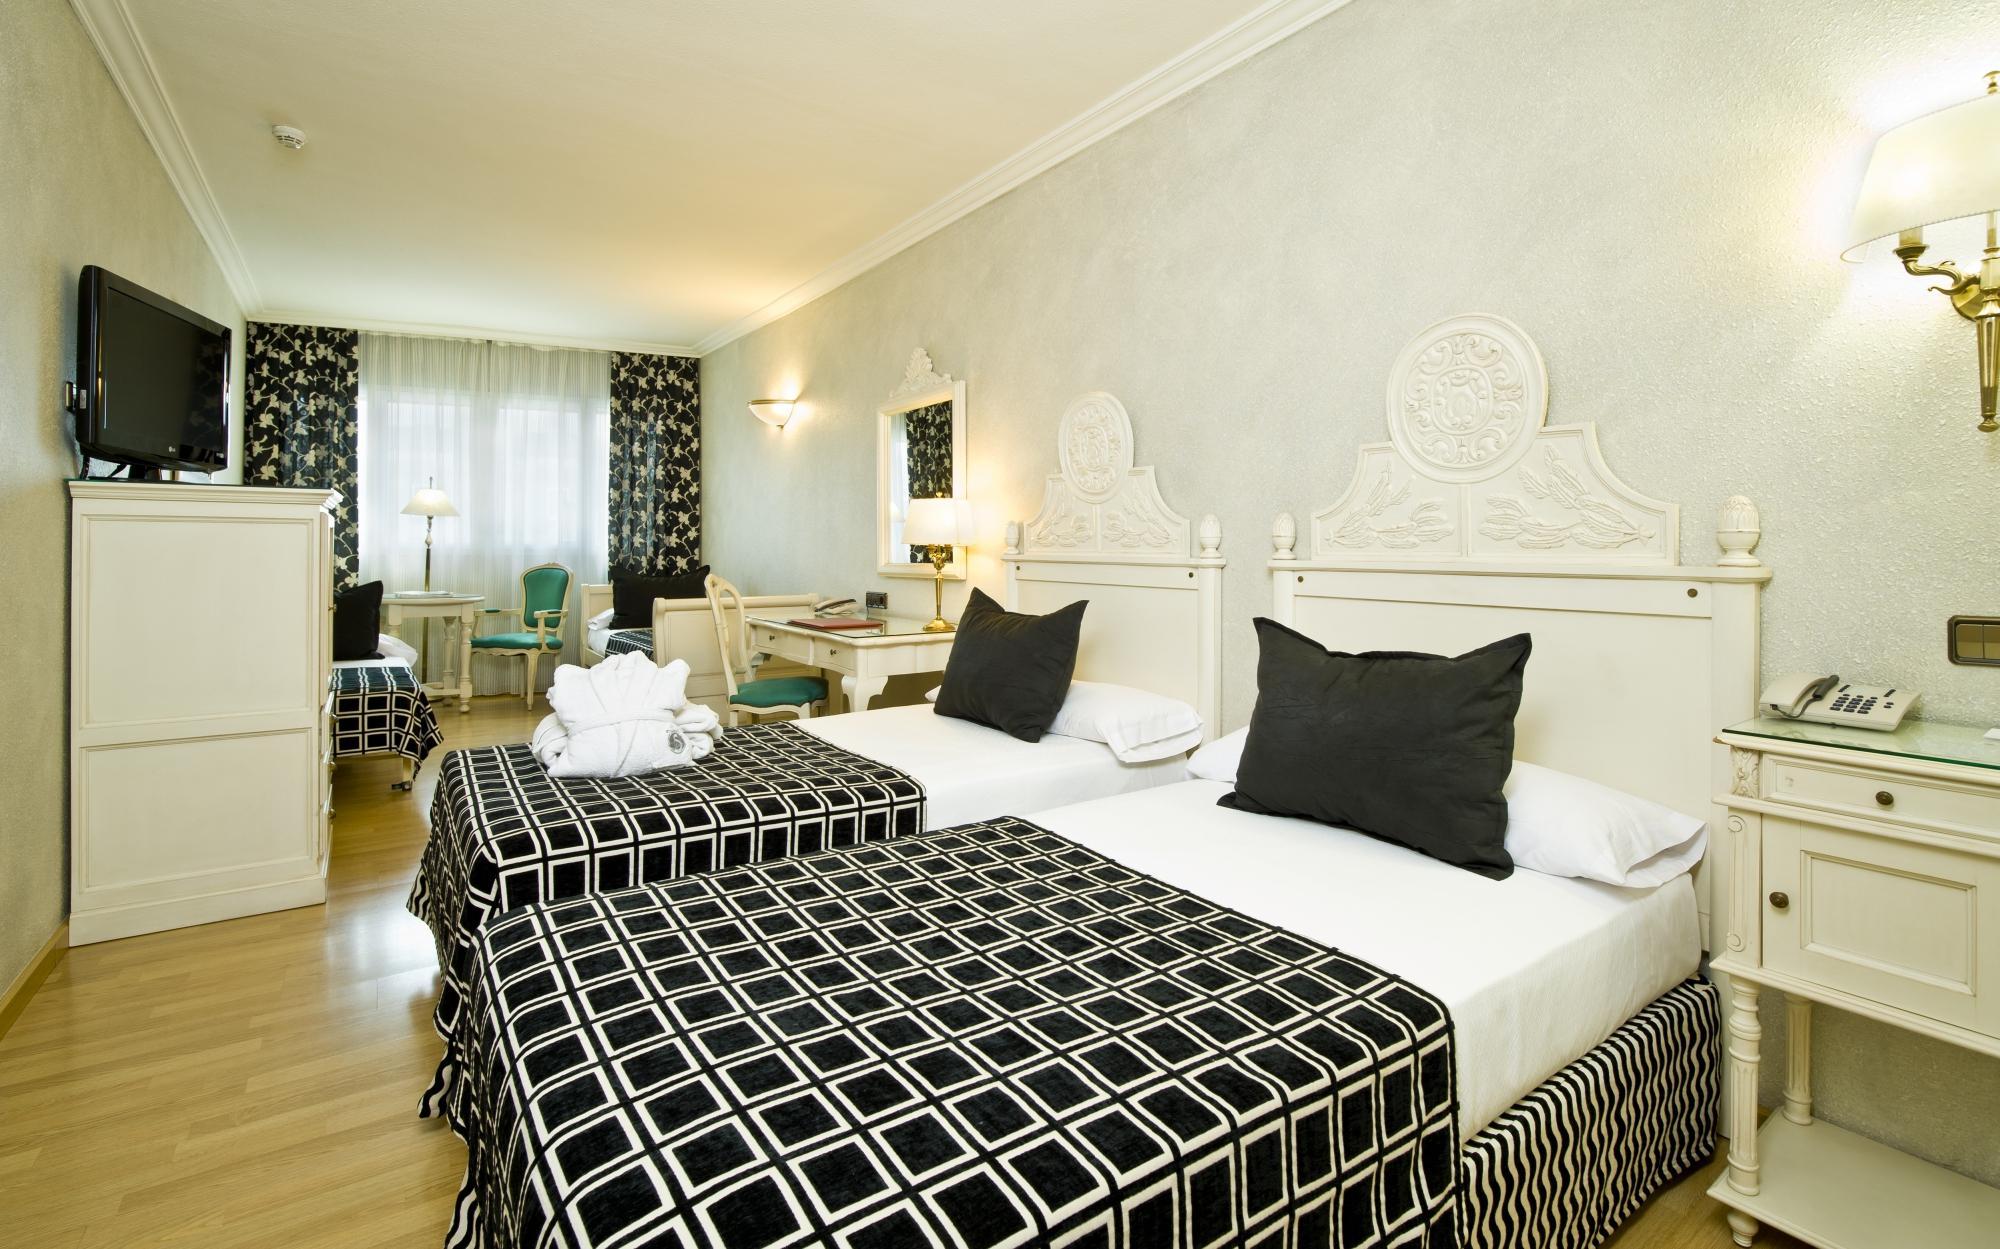 salles hotel pere iv updated 2017 reviews price comparison barcelona catalonia tripadvisor